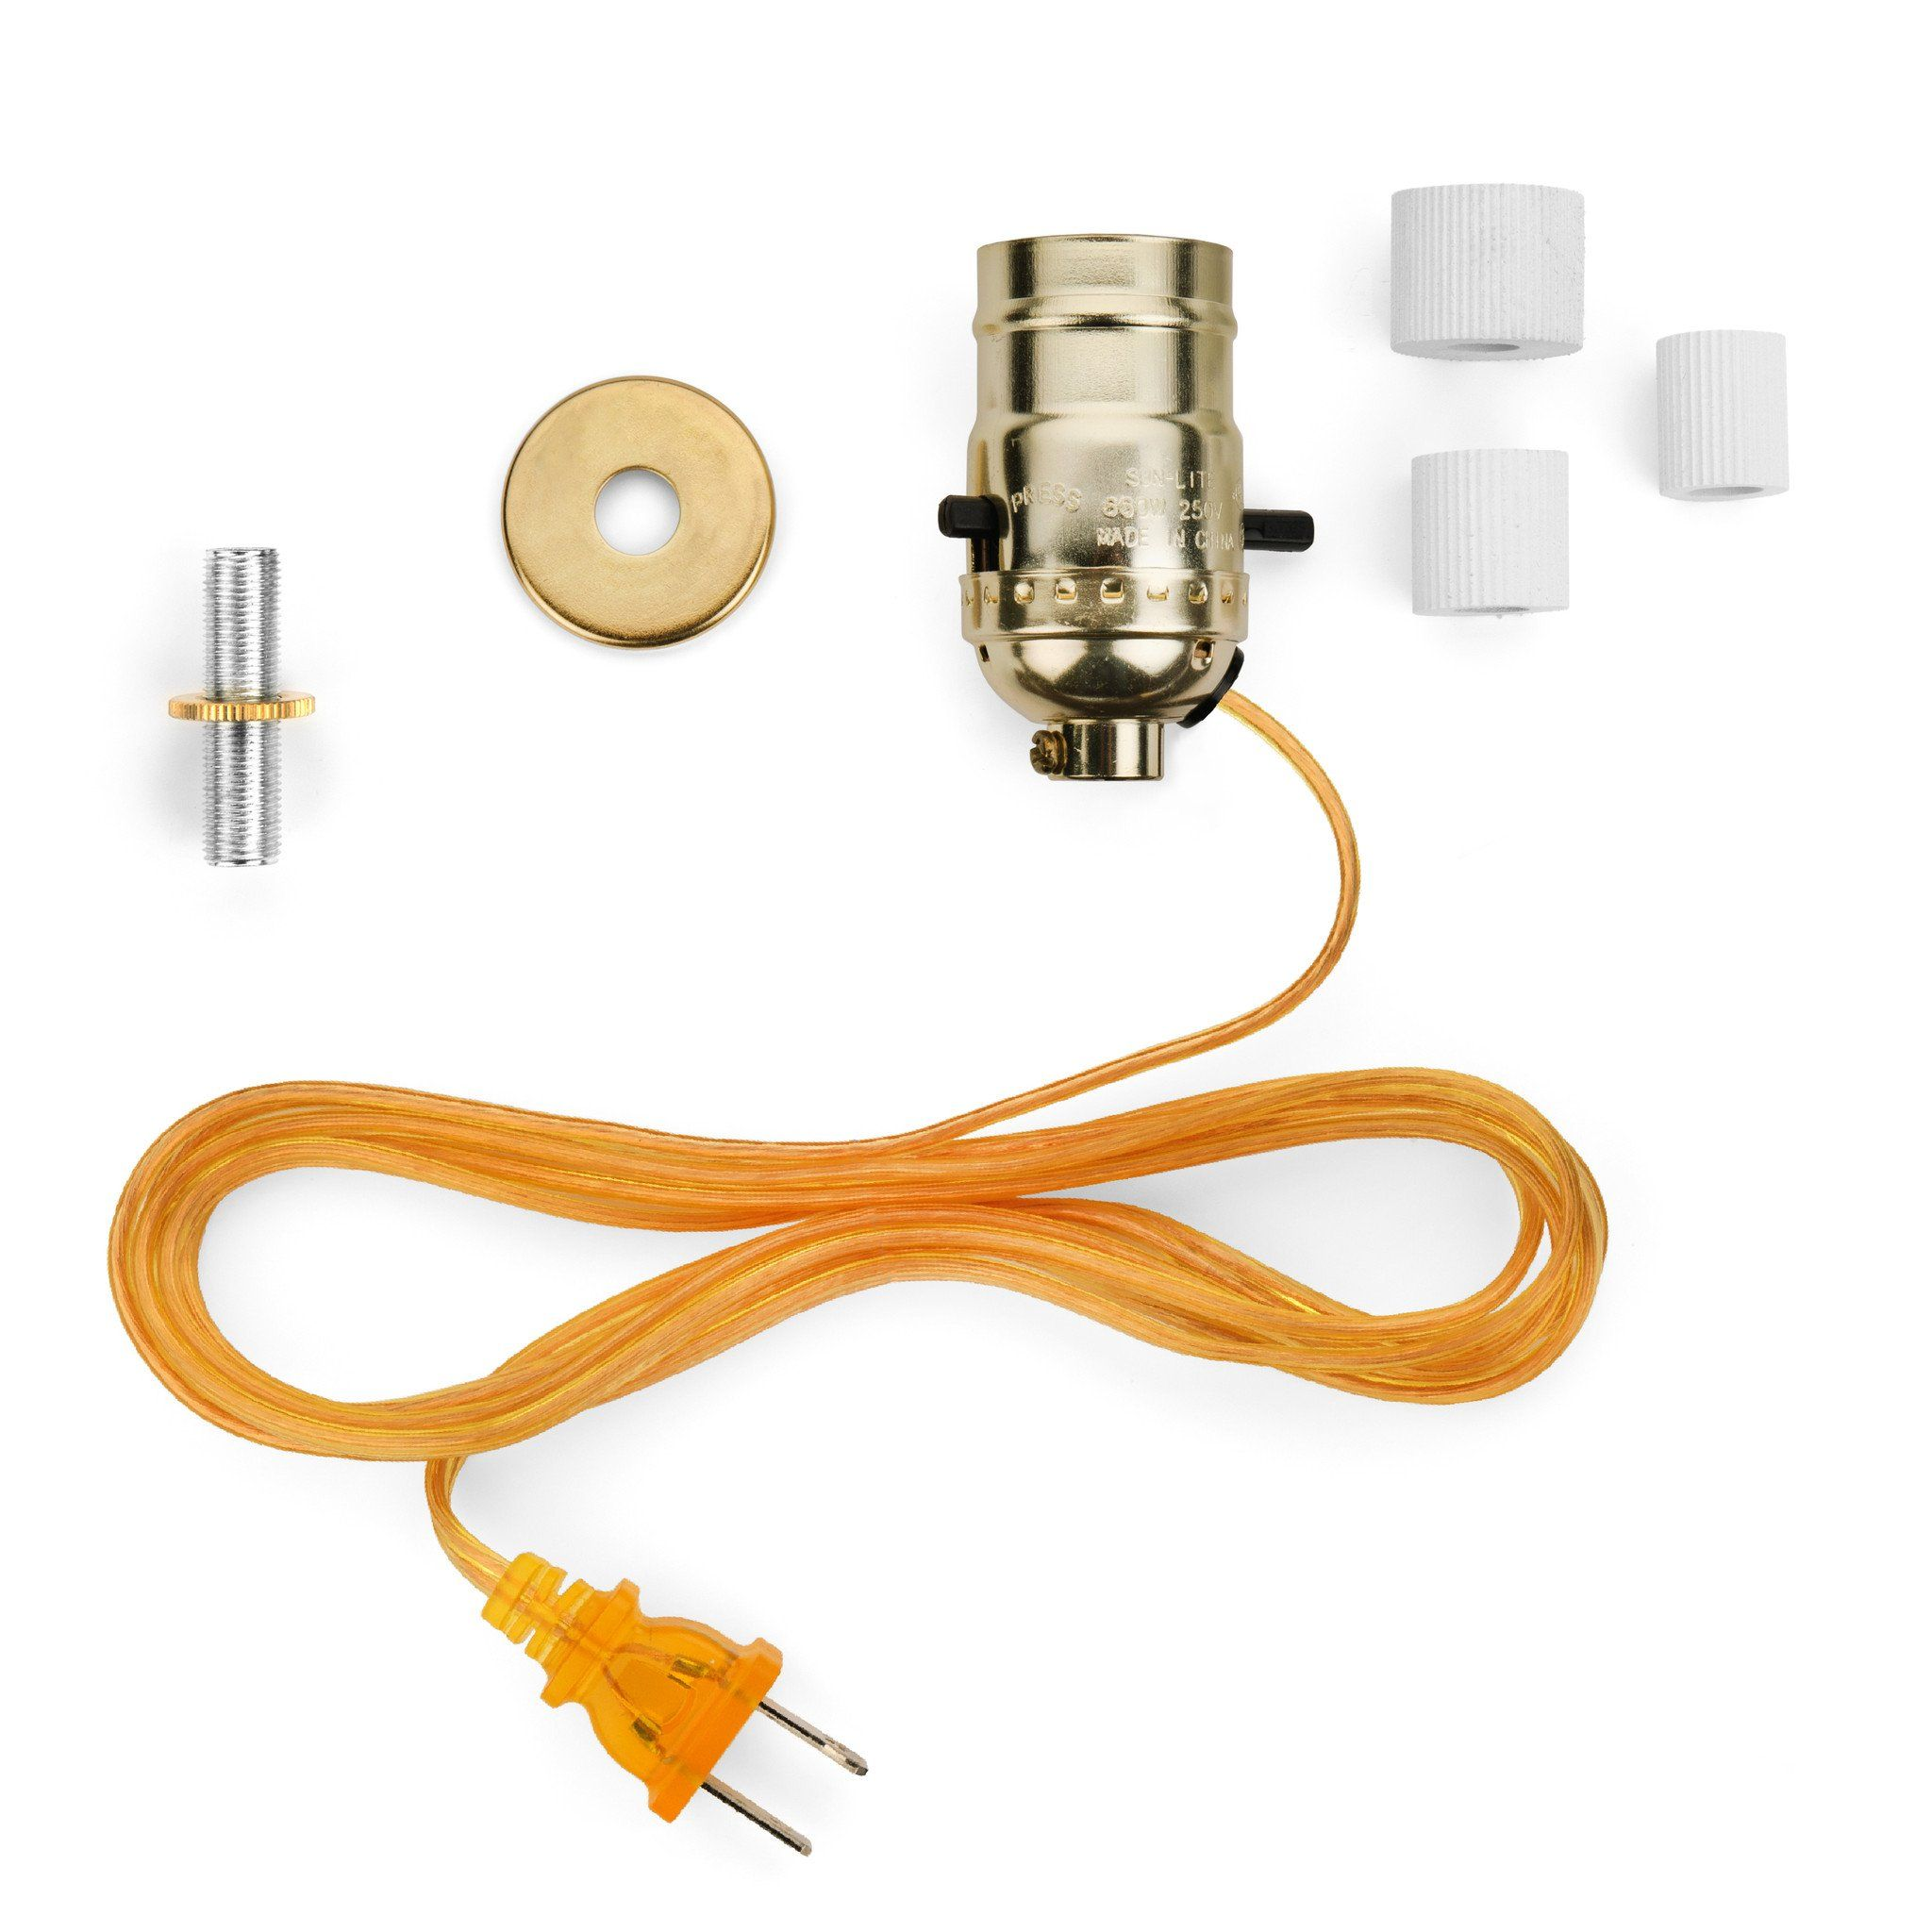 Diy lamp wiring wire center bottle lamp wiring kit diy bottle bottle and liquor bottles rh pinterest com diy lamp cord keyboard keysfo Choice Image